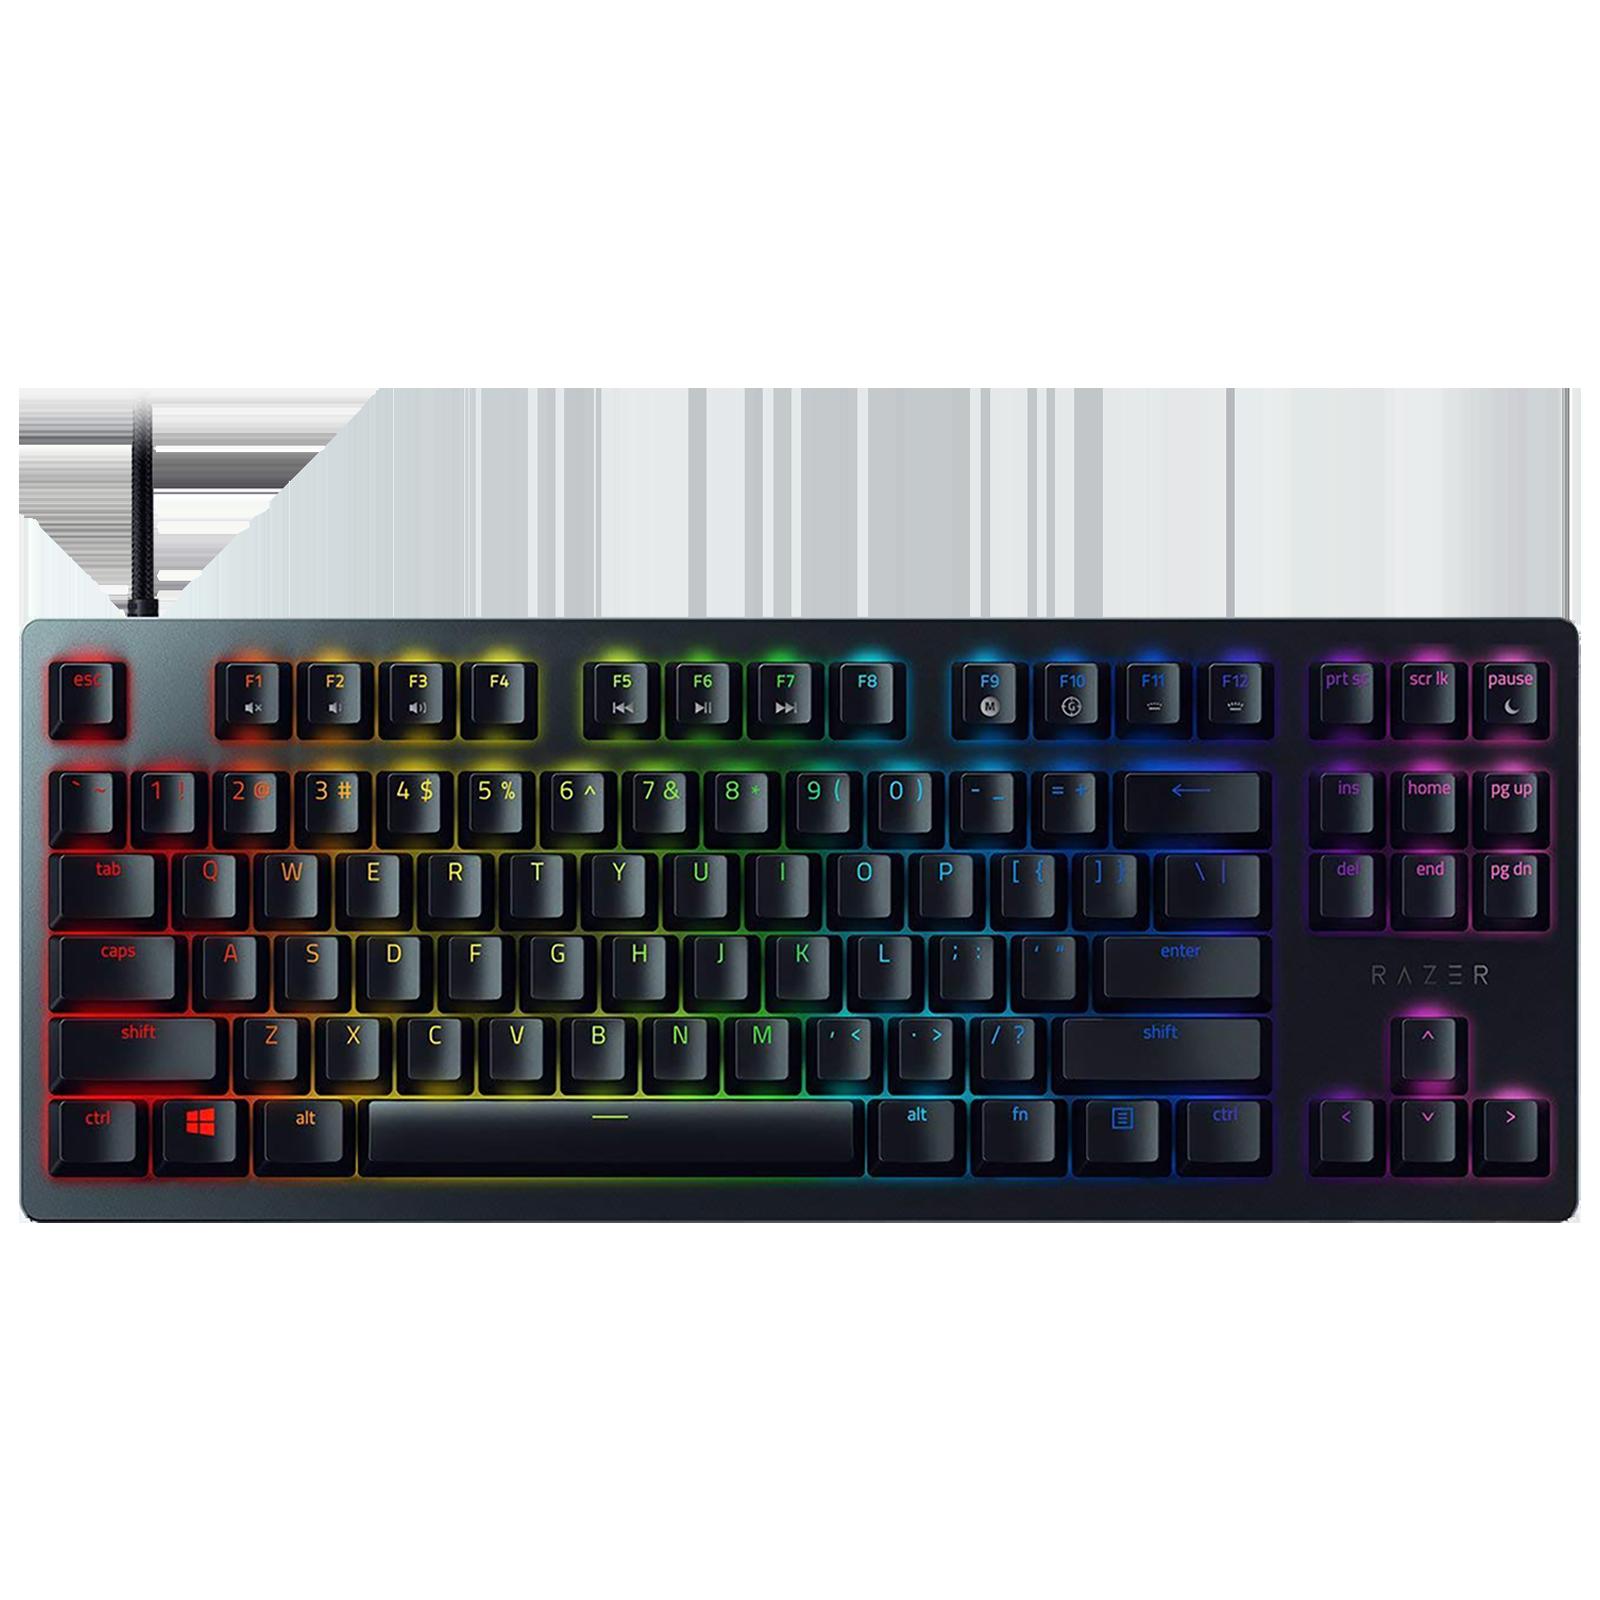 Razer Huntsman Tournament Edition Wired Gaming Keyboard (Linear Optical Switch, RZ03-03080100-R3M1, Black)_1